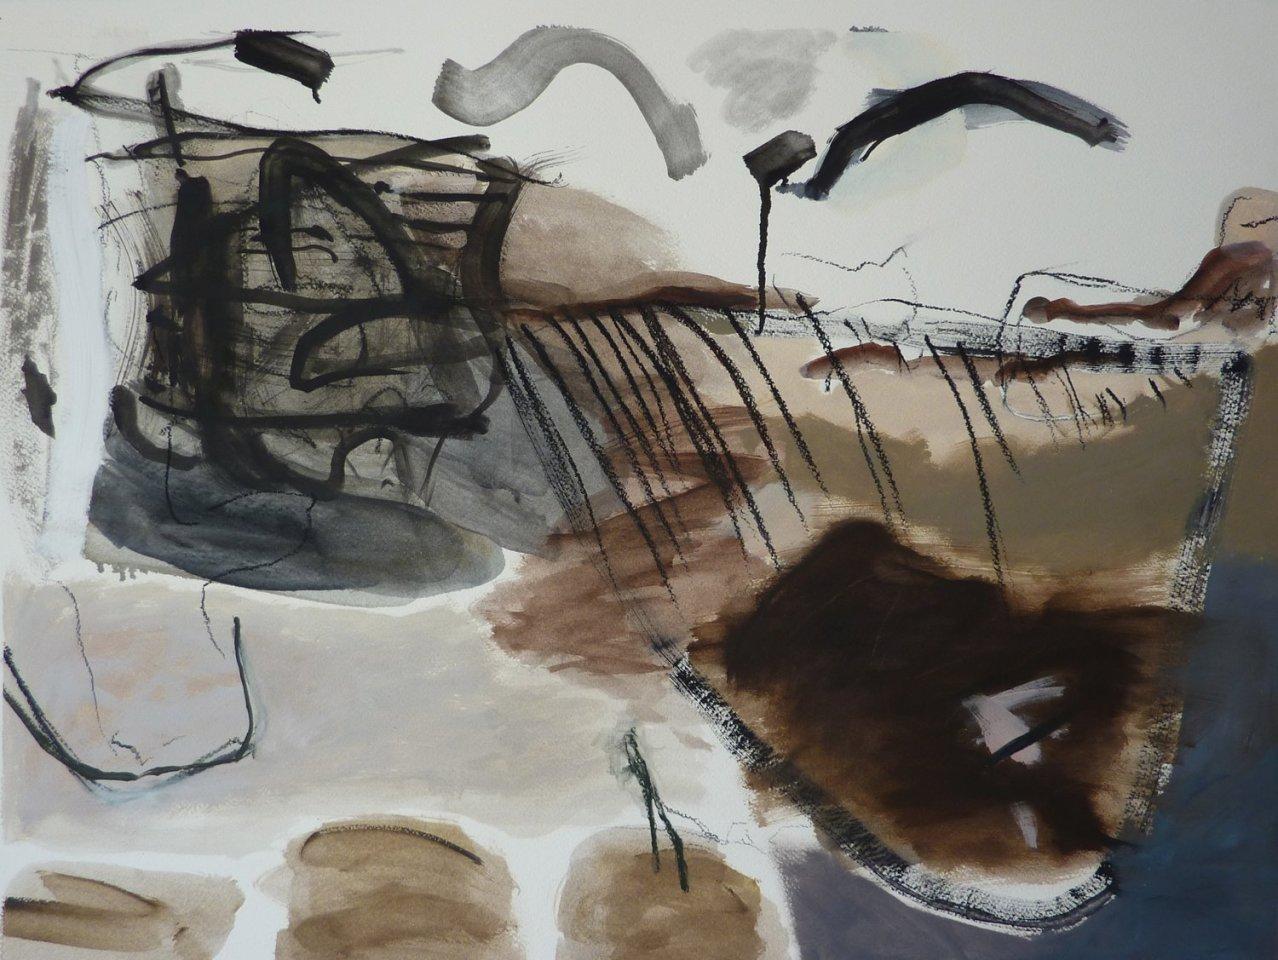 Dooze Storey, Hitch (London Gallery)